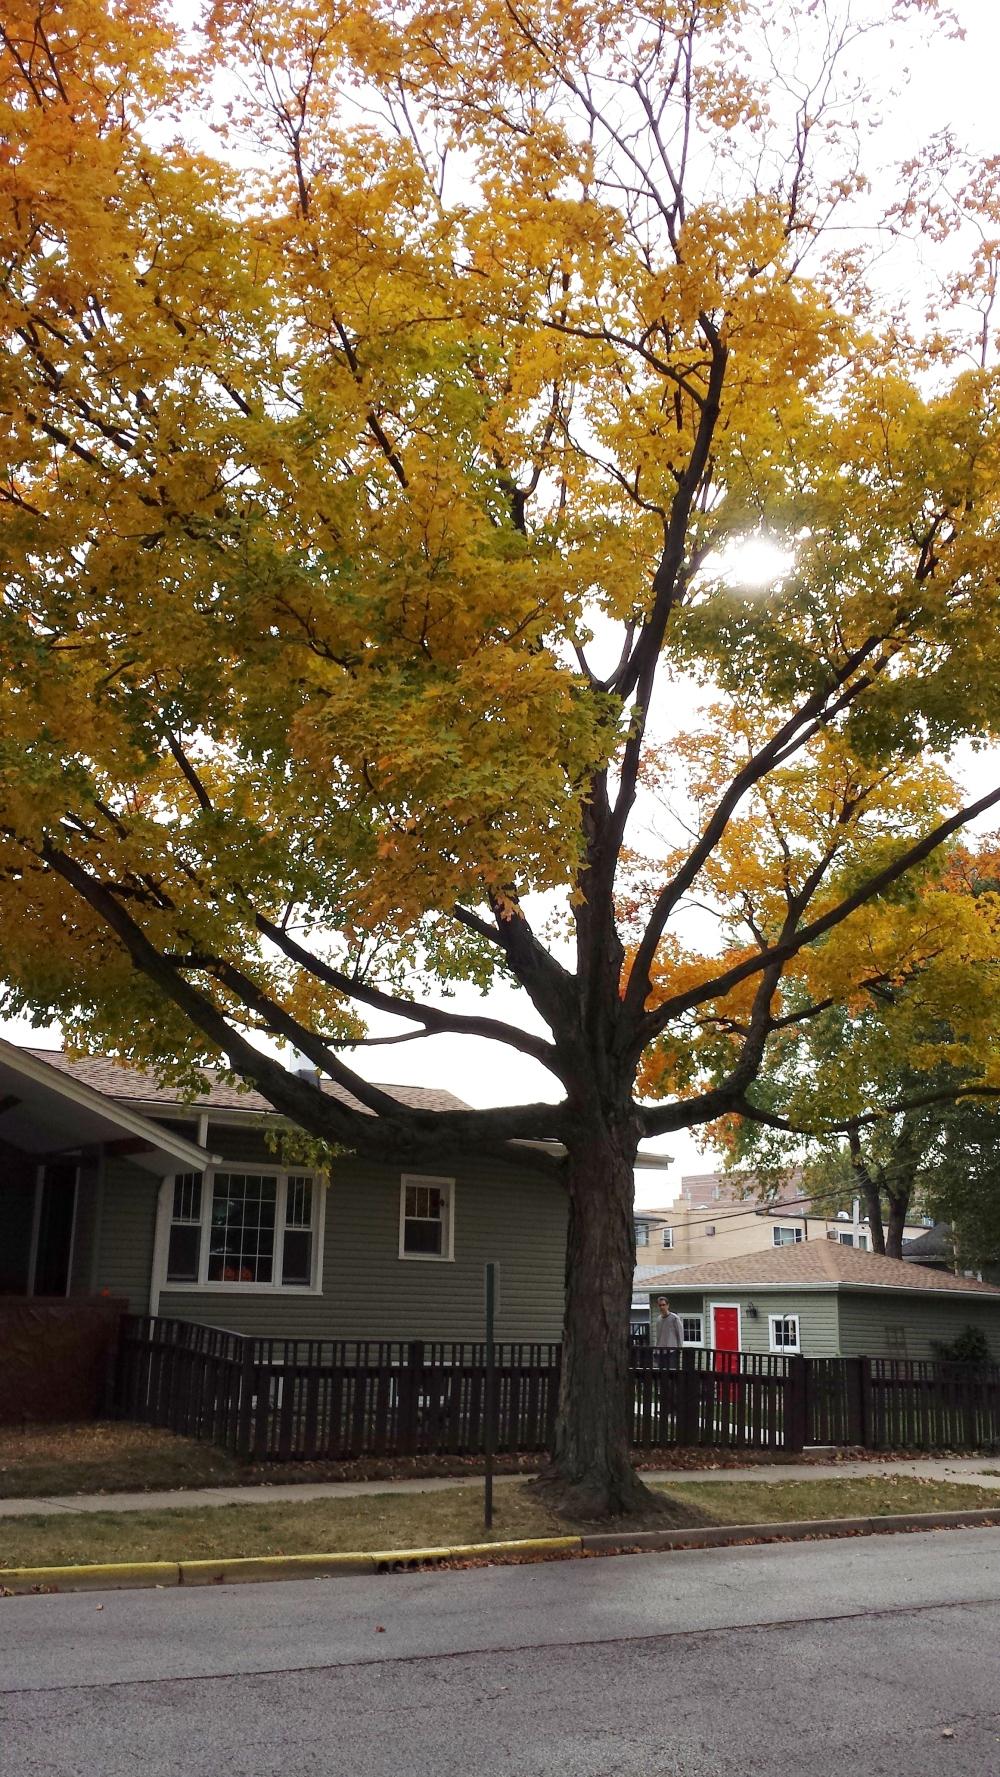 Sun filters through canopy of an autumn maple